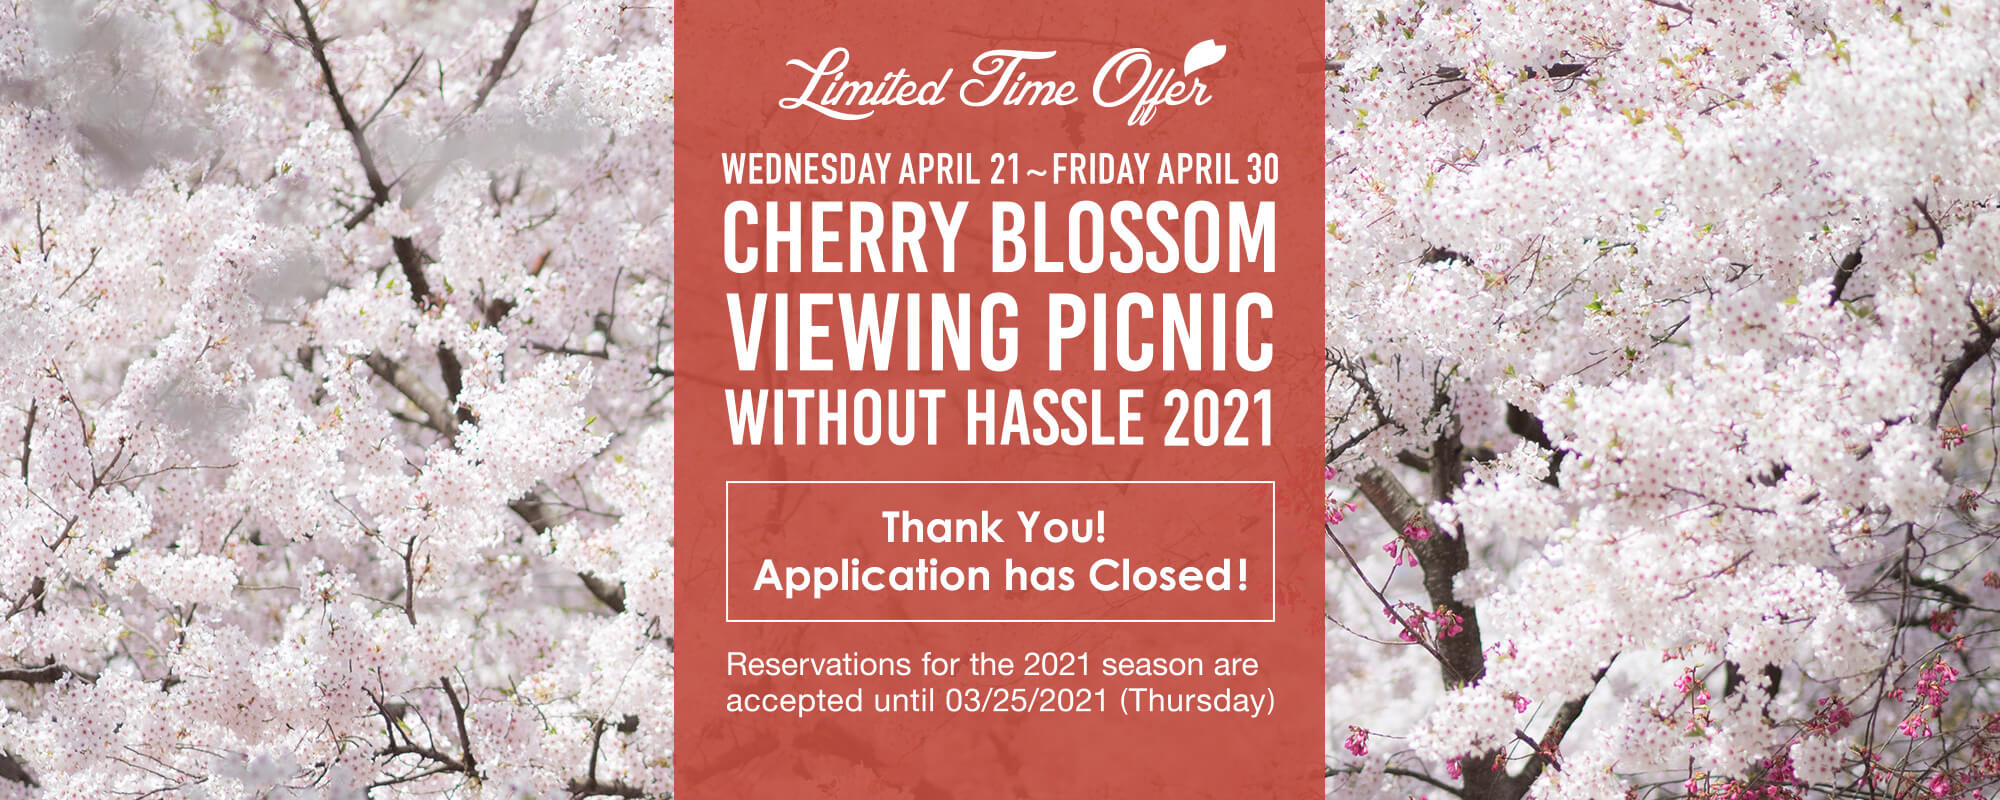 Tebura de Kanokai – Cherry Blossom Viewing Picnic without Hassle